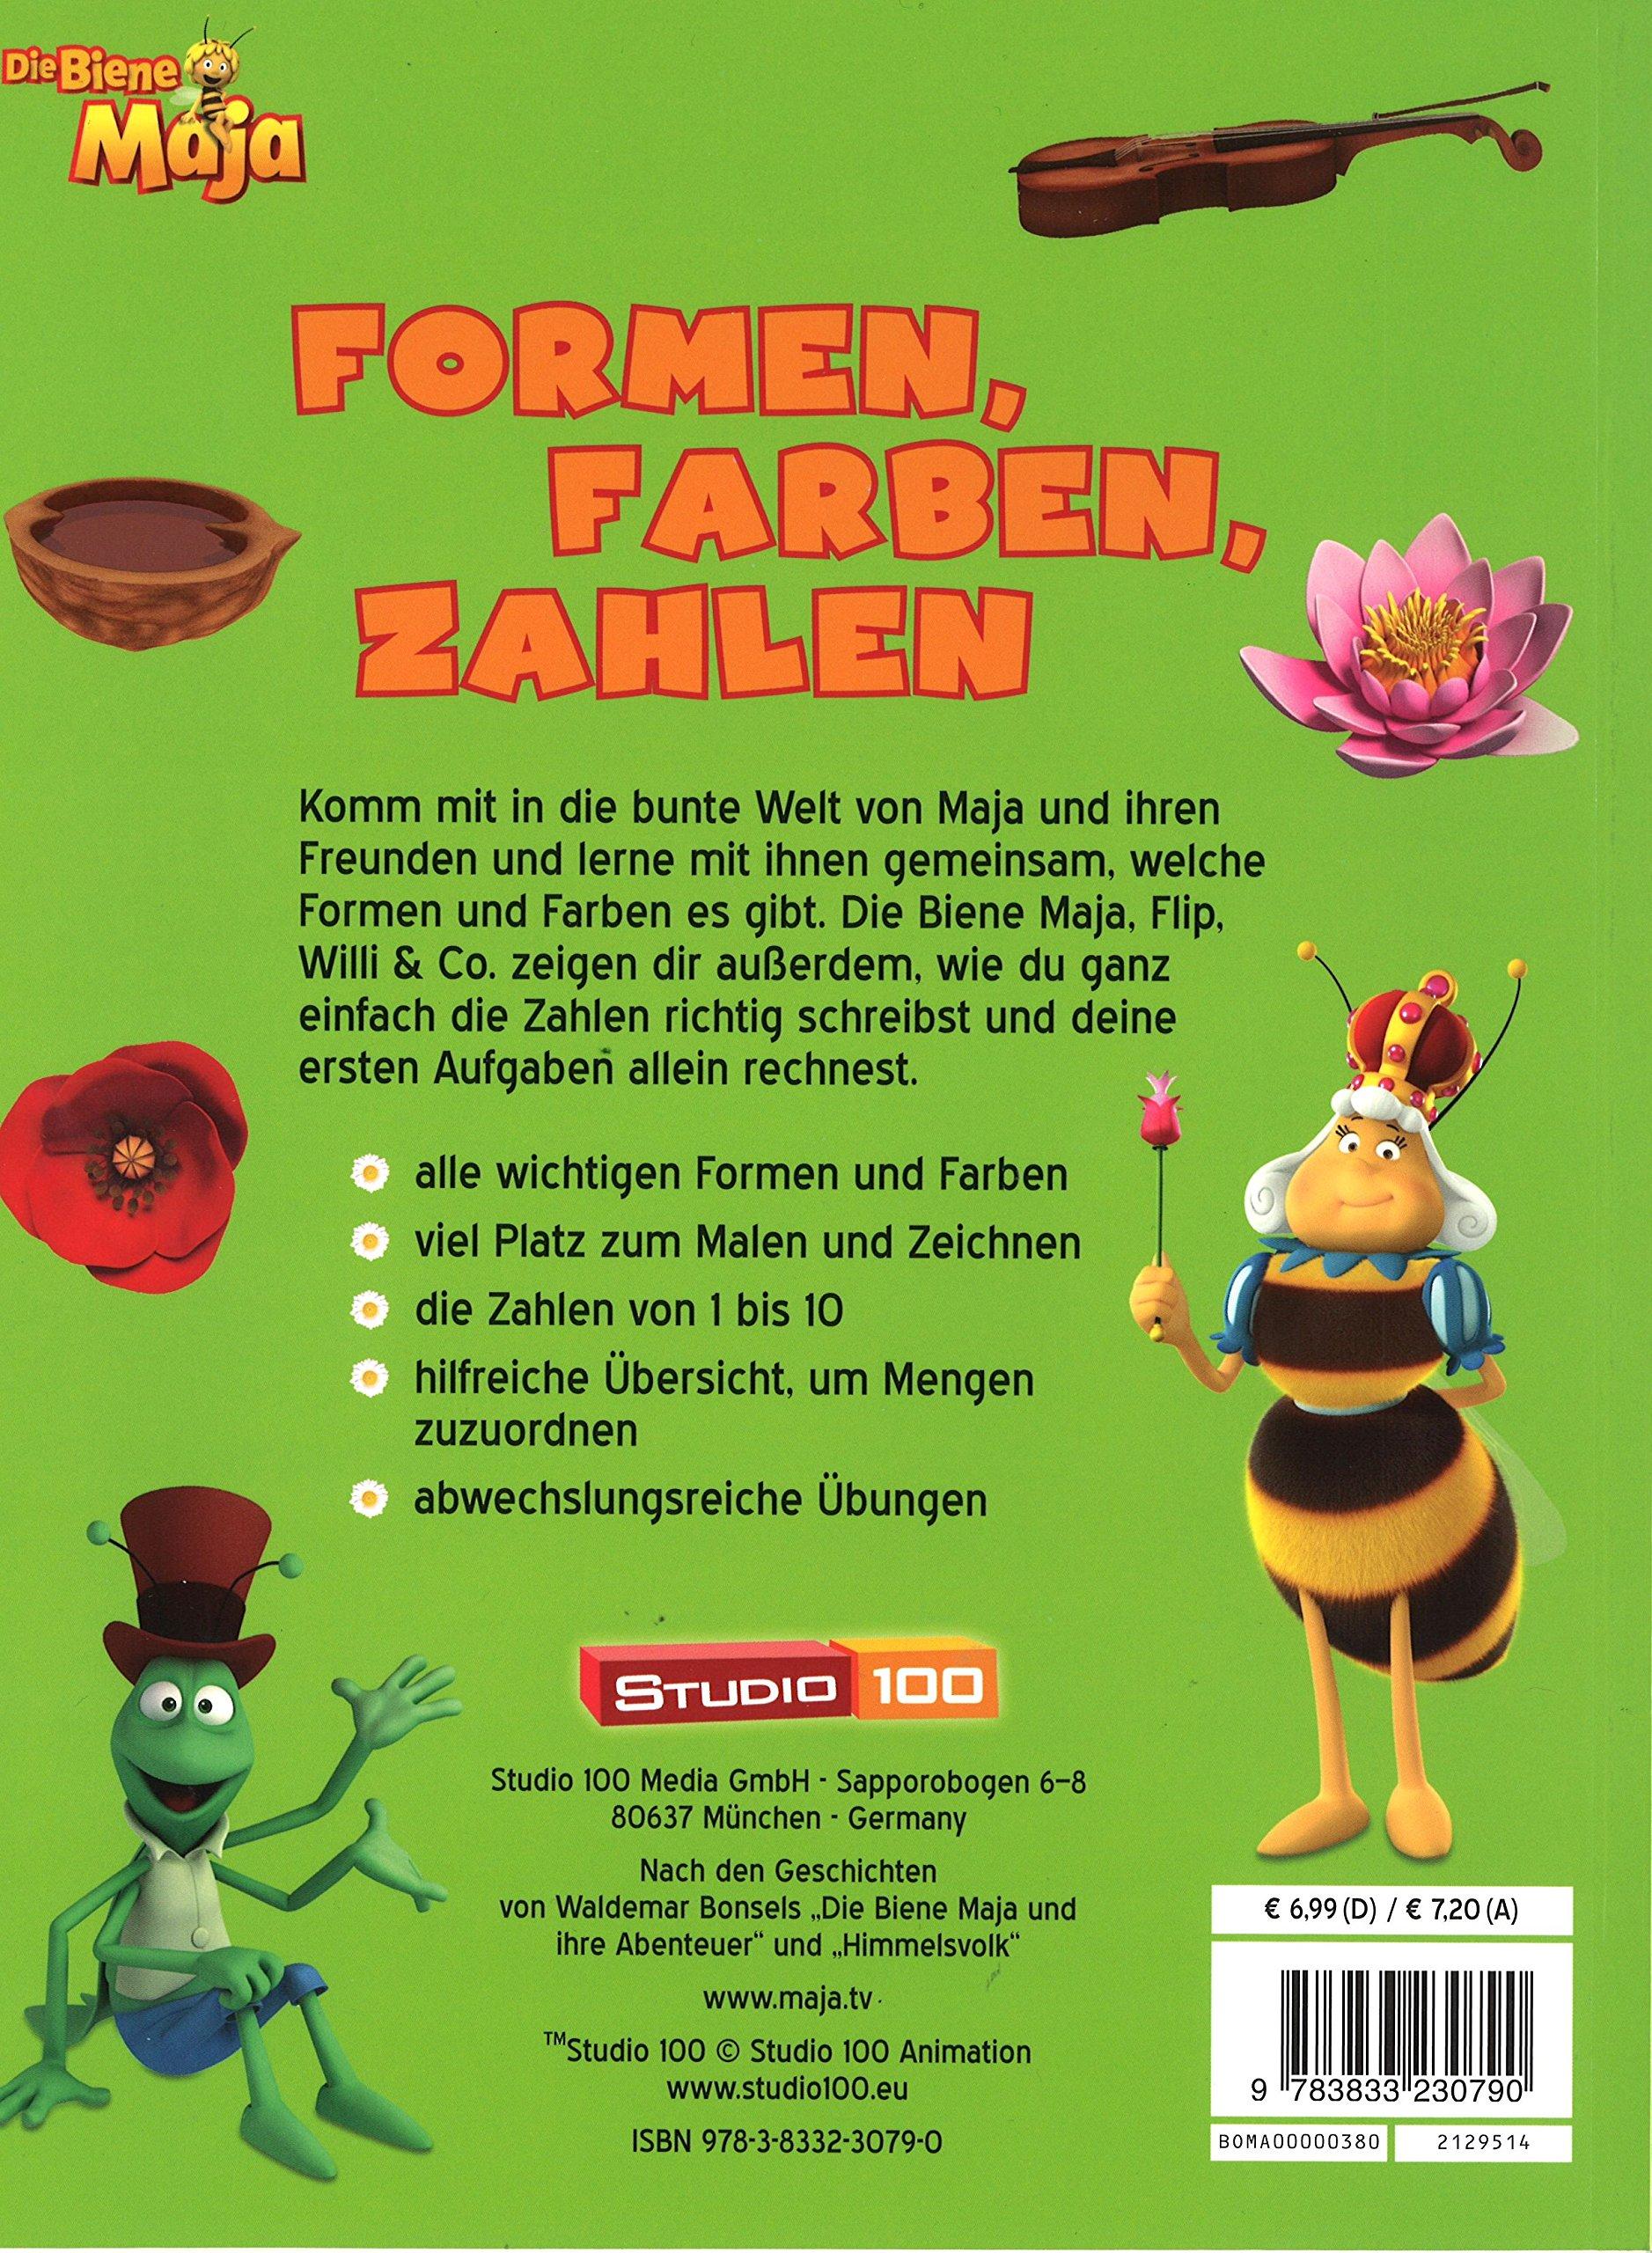 Die Biene Maja - Formen, Farben, Zahlen: 9783833230790: Amazon.com ...